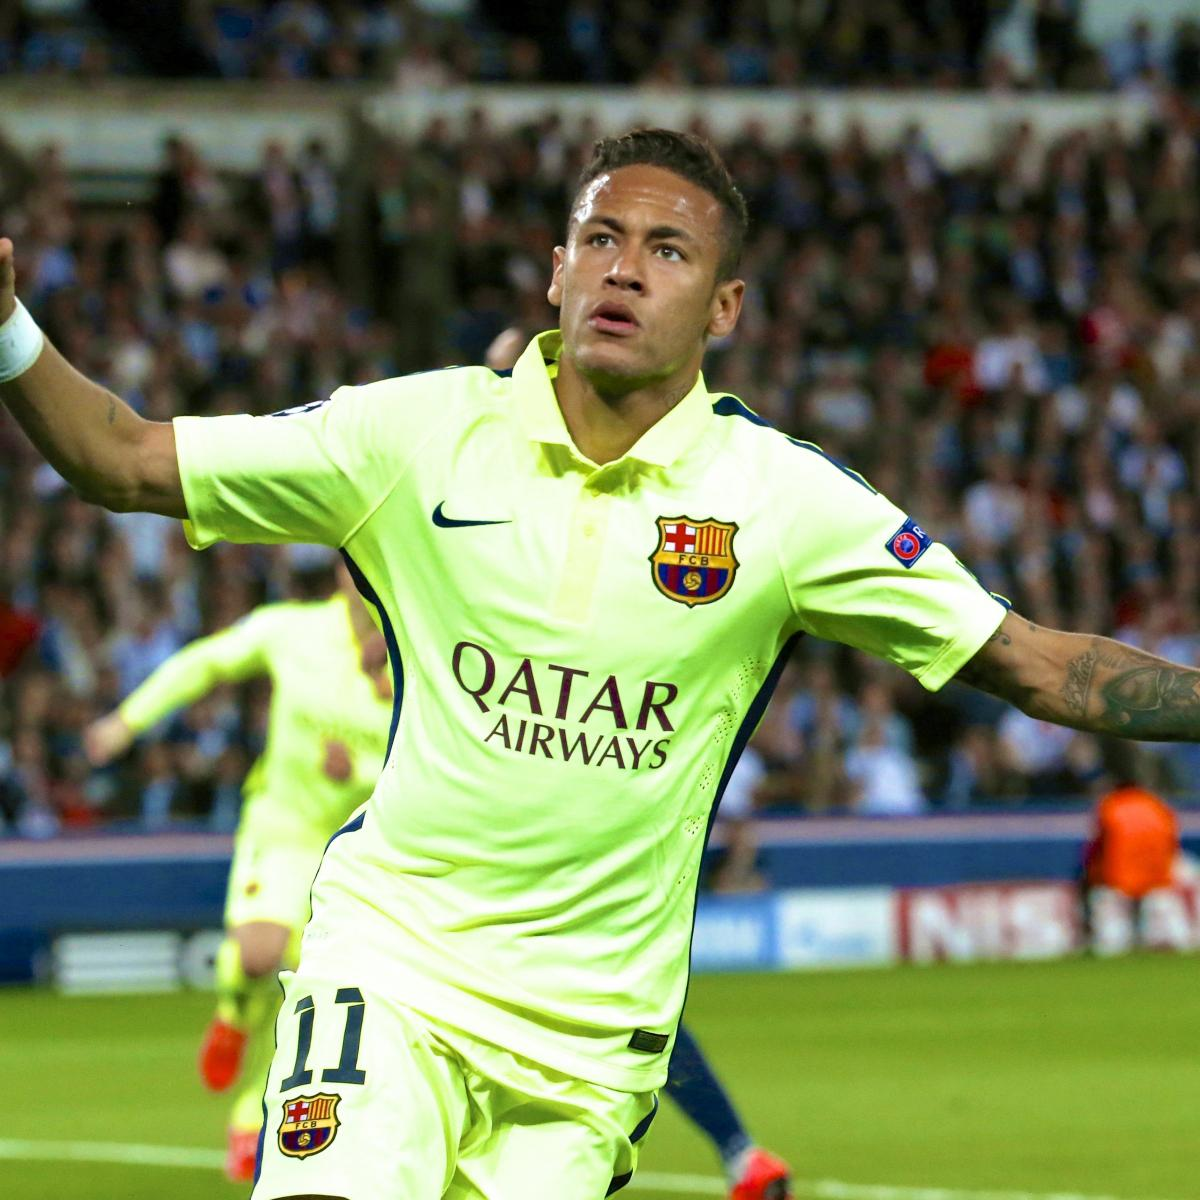 PSG Vs. Barcelona: Live Score, Highlights From Champions